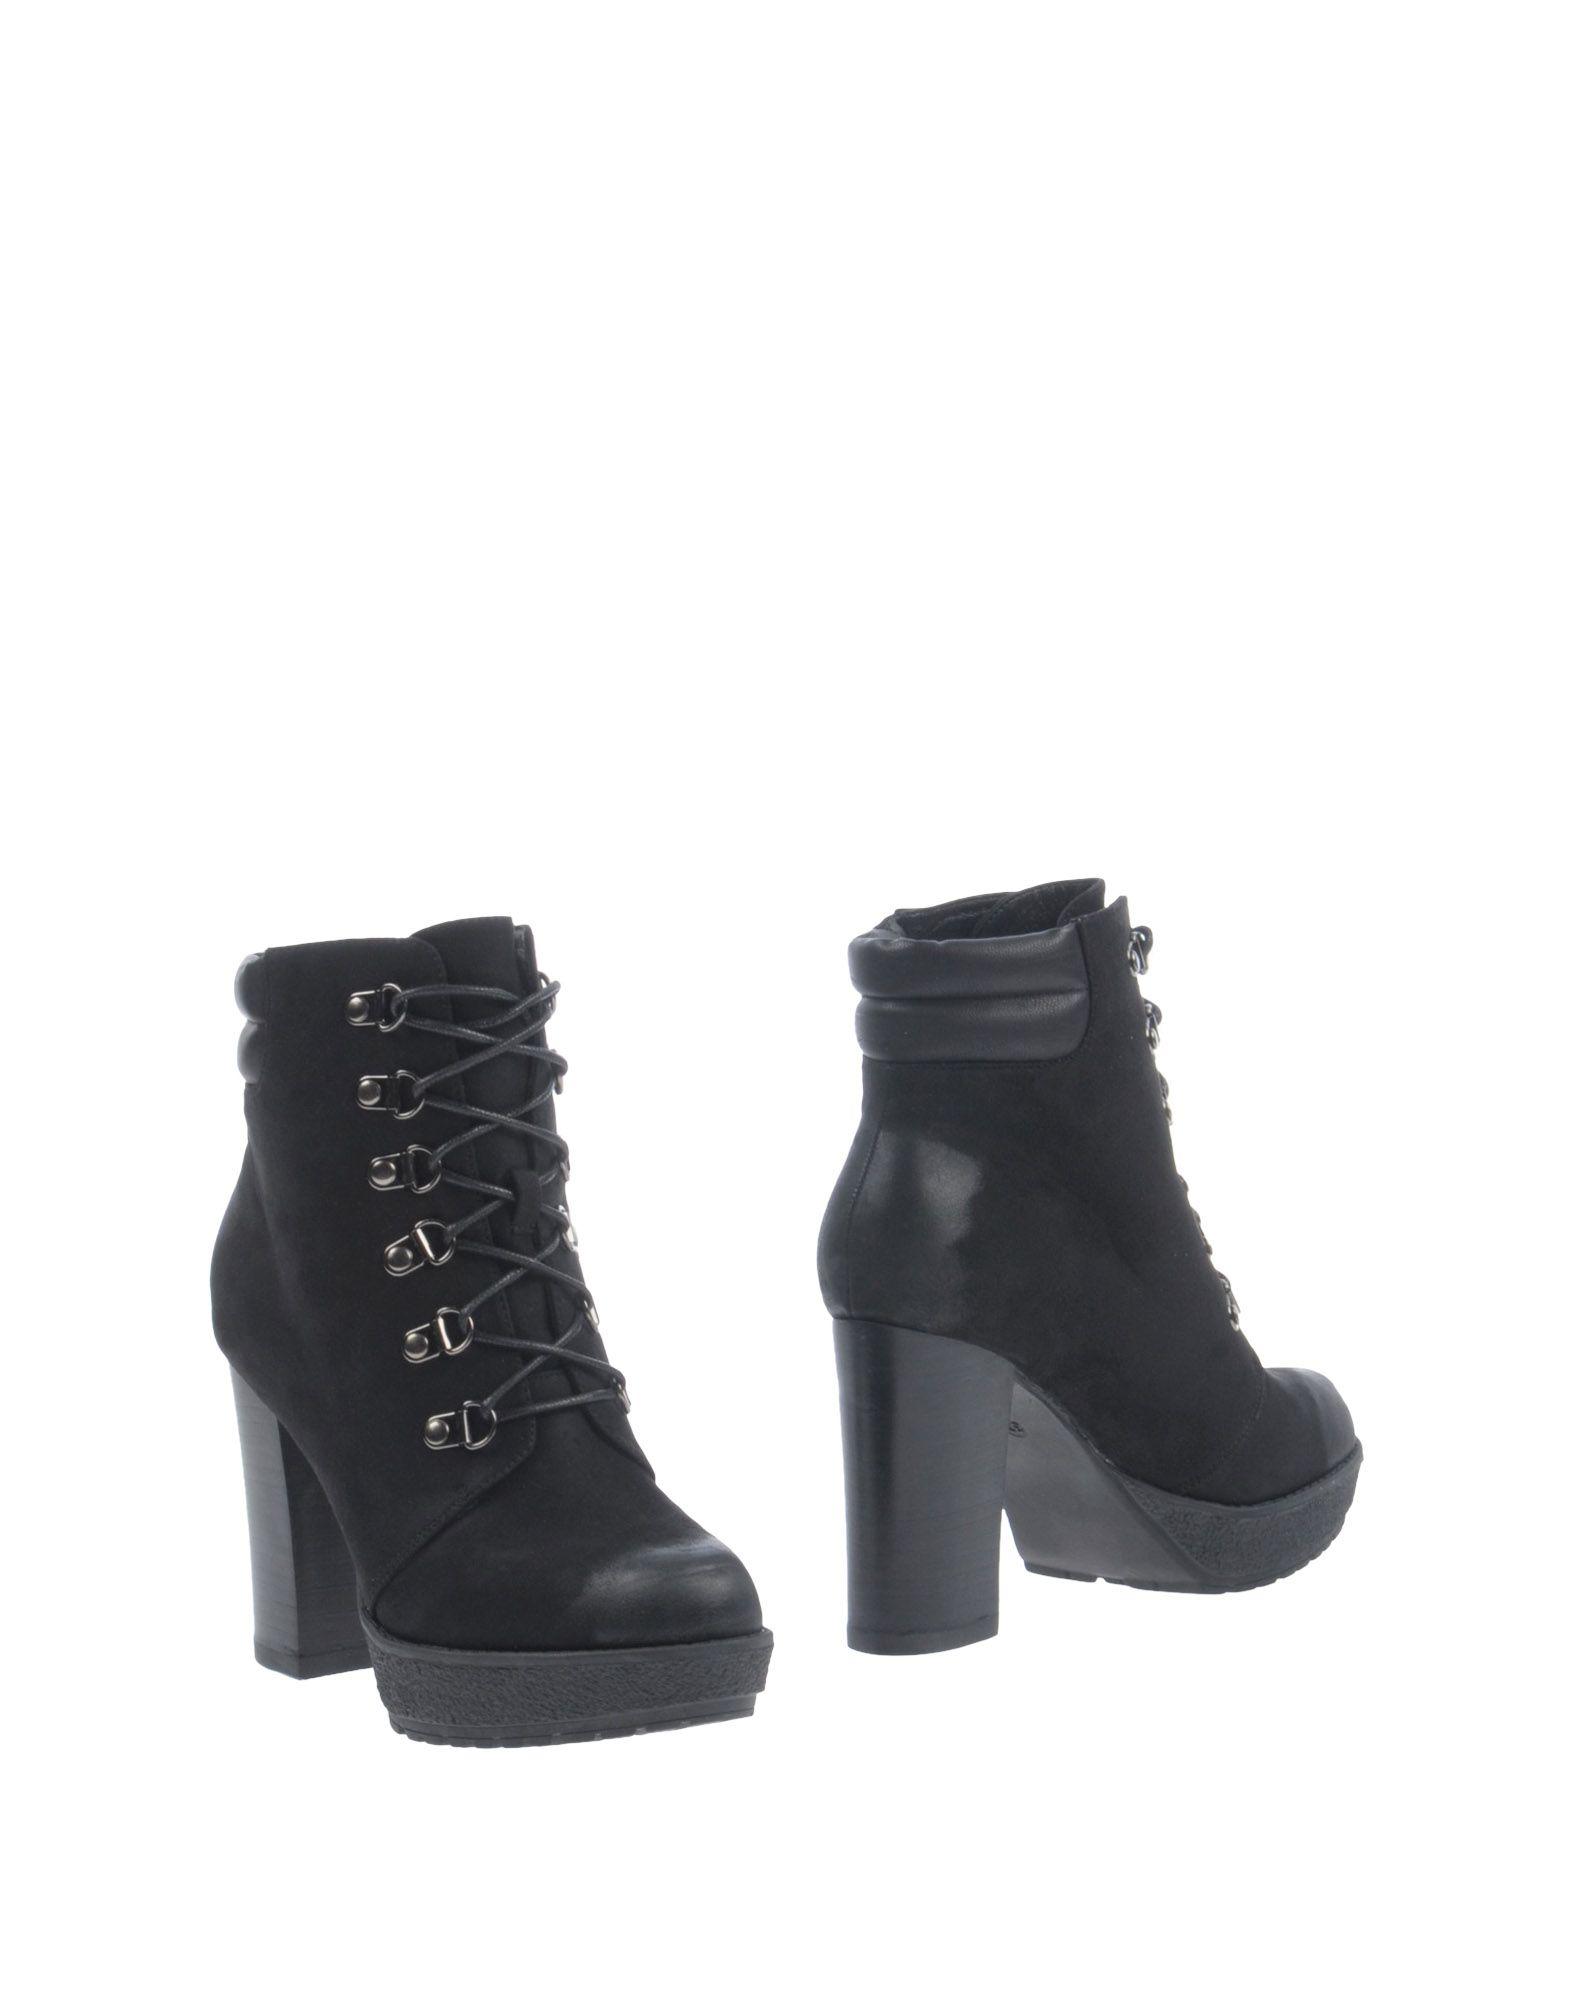 Francesco Milano Gute Stiefelette Damen 11445251WH Gute Milano Qualität beliebte Schuhe b6cc8b